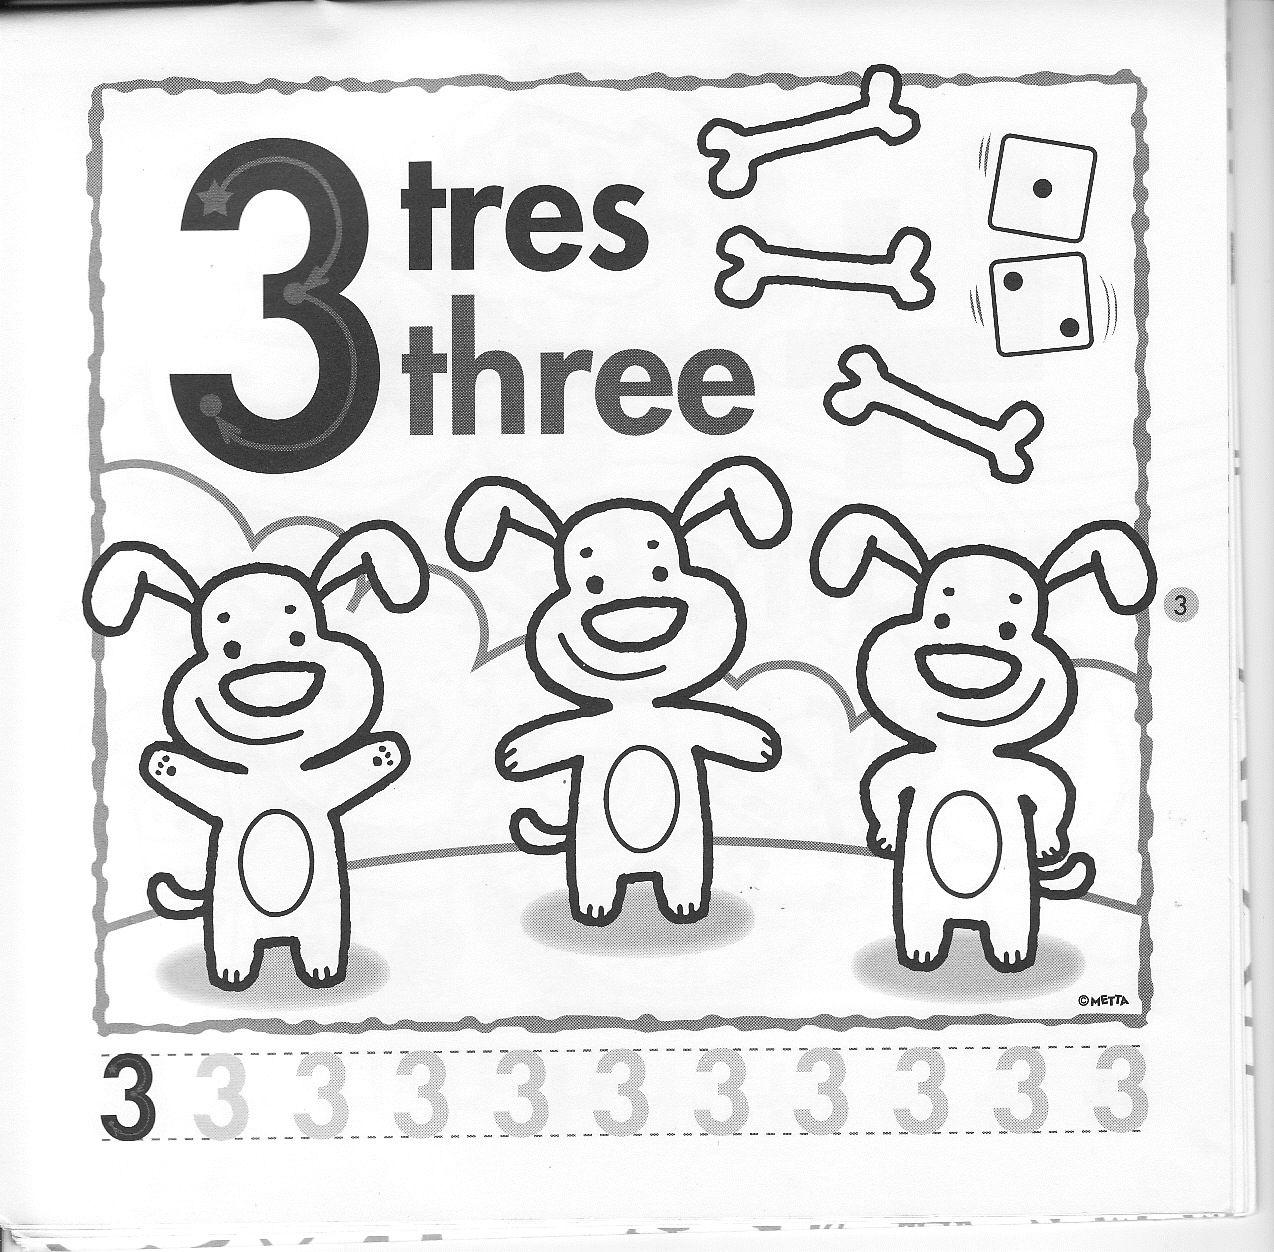 Fichas de Inglés para niños: Fichas de números en inglés | Numbers ...